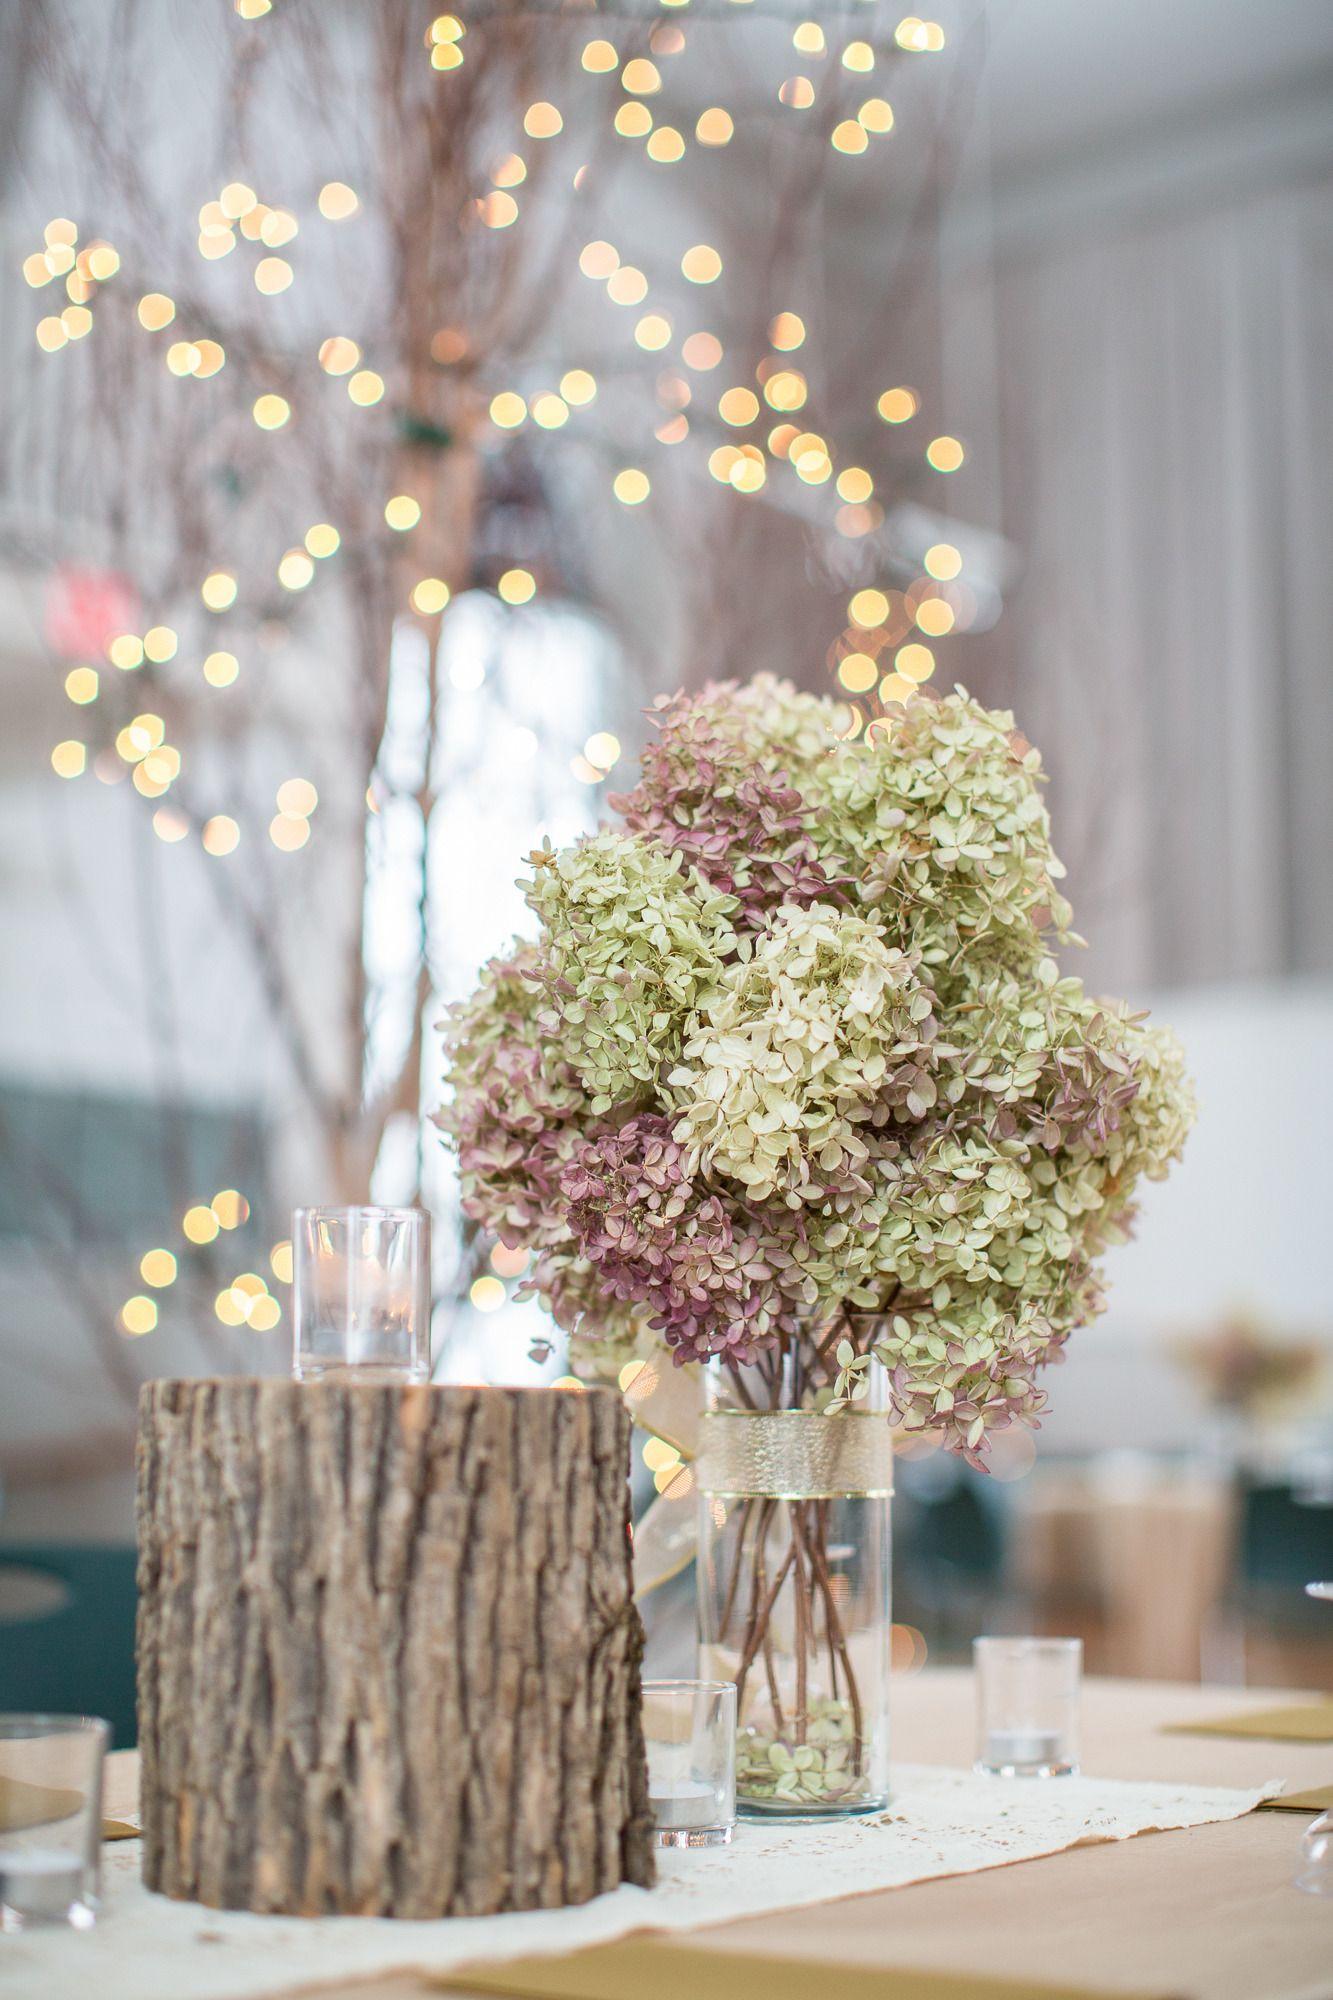 New Hampshire Winter Wedding at Alumni Hall in 2020